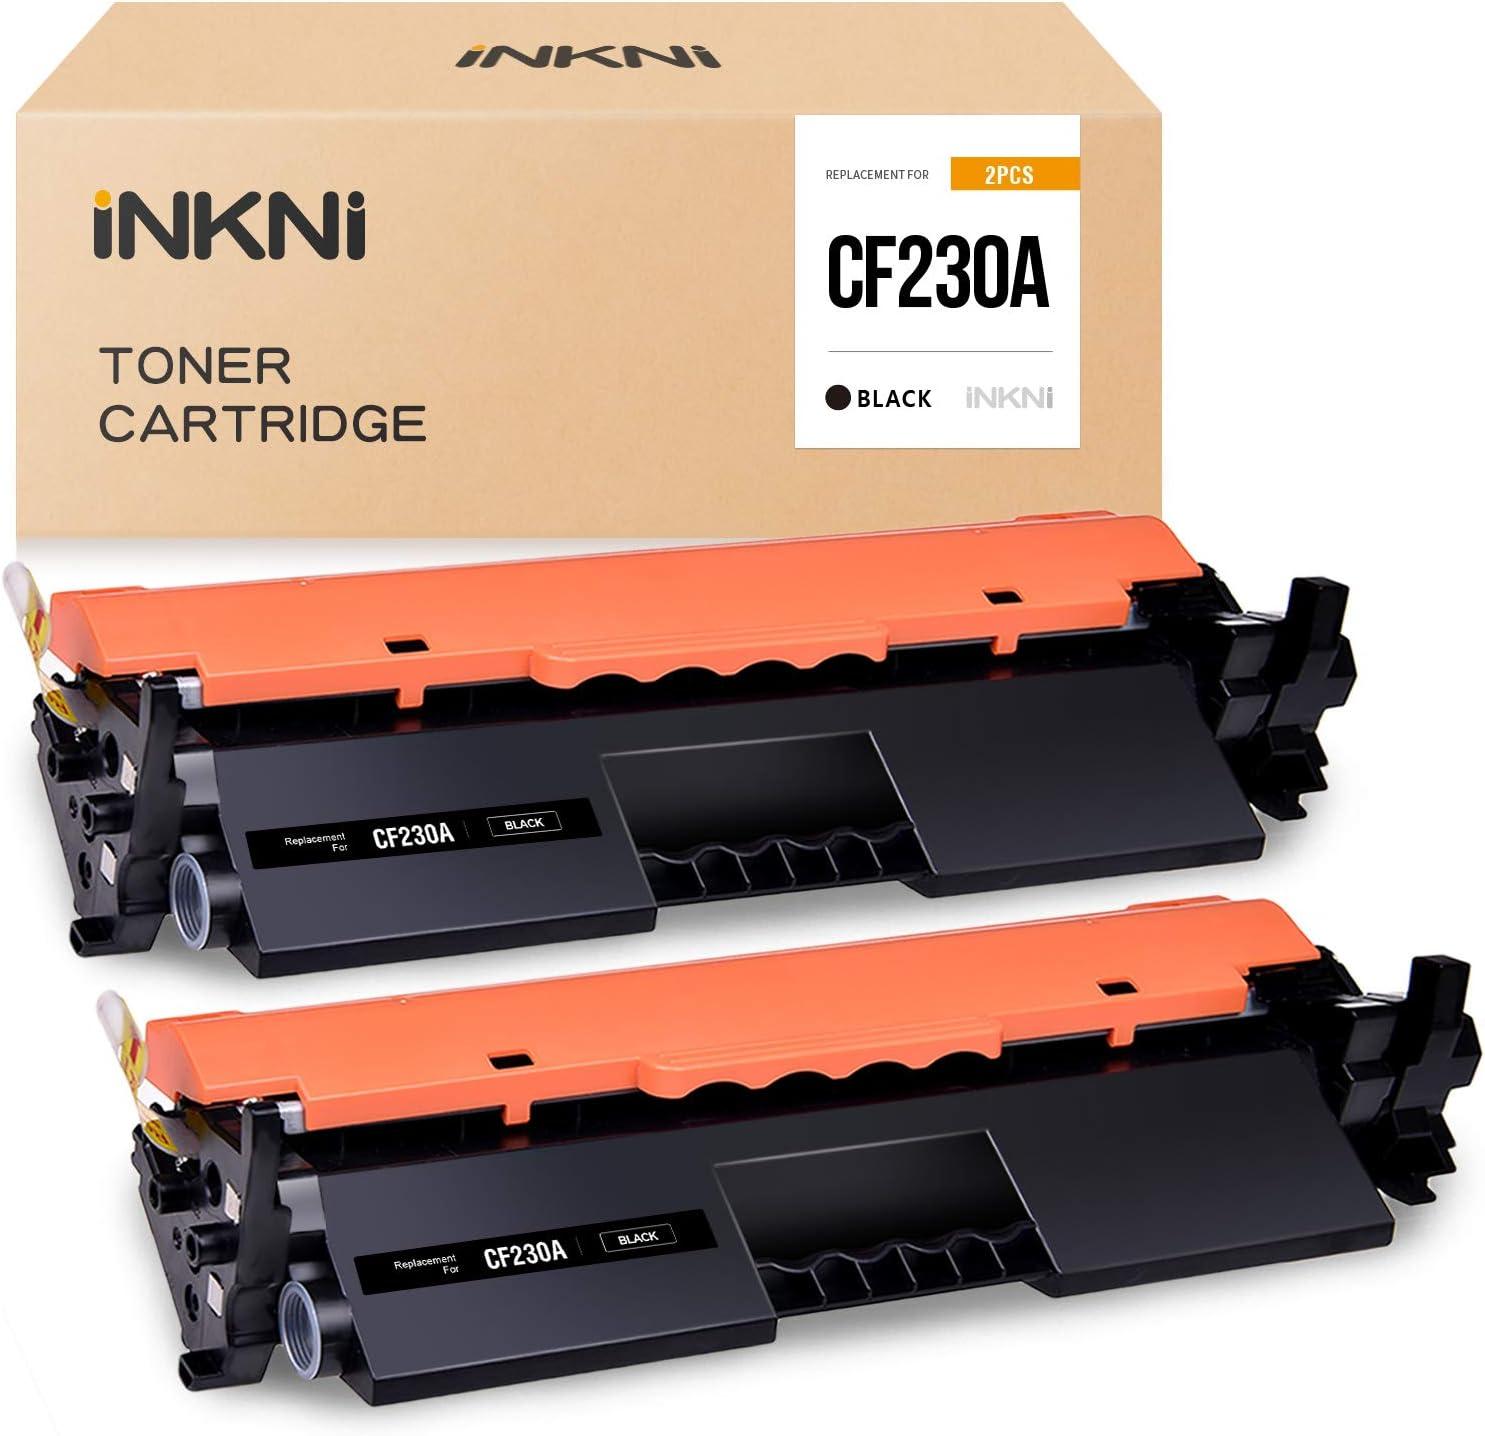 INKNI Compatible Toner Cartridge Replacement for HP 30A 30X CF230A CF-230 for HP Laserjet Pro MFP M227fdw M203dw M227fdn M203d M203dn M227sdn Printer (Black, 2 Pack)